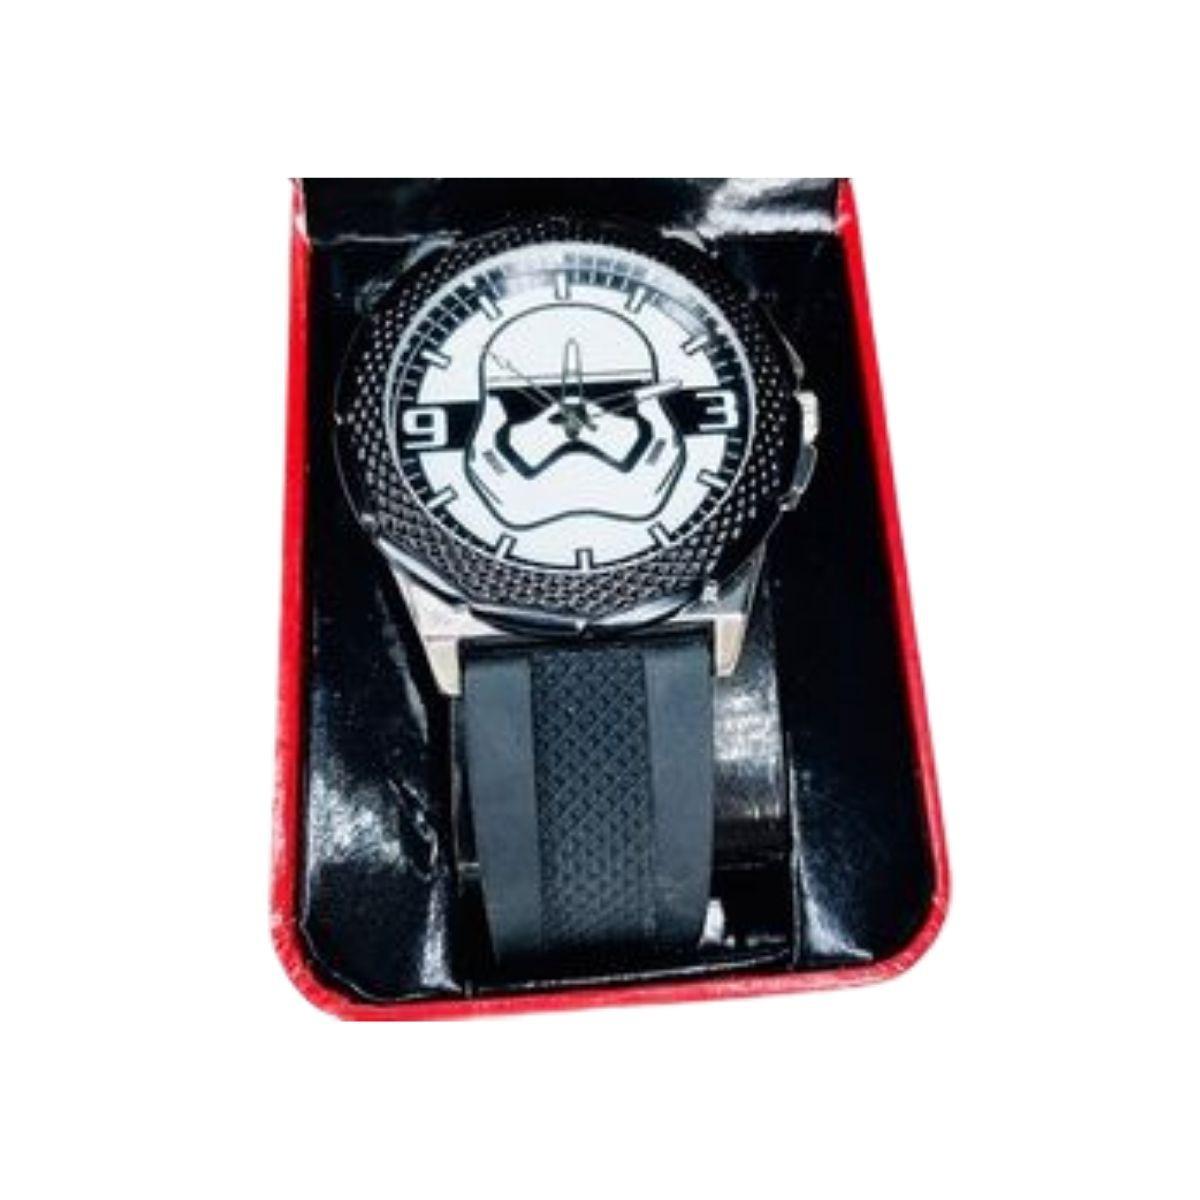 Relógio de Pulso Star Wars Stomper Trooper   - Game Land Brinquedos